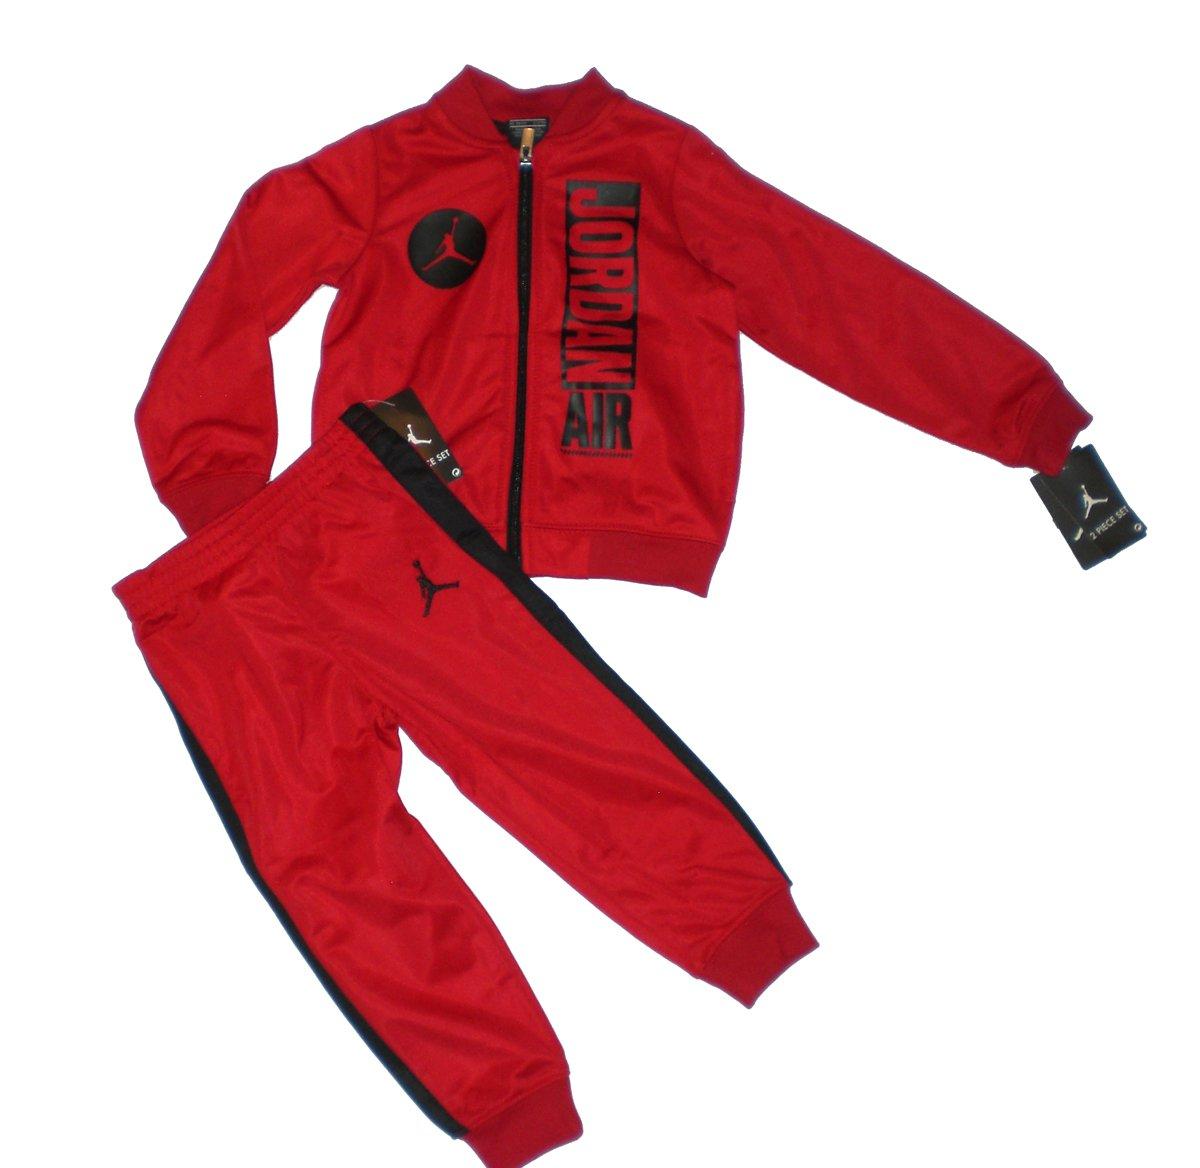 Nike Jordan Jumpman Boy Jacket Tracksuit Pants Outfit Set, Size 4